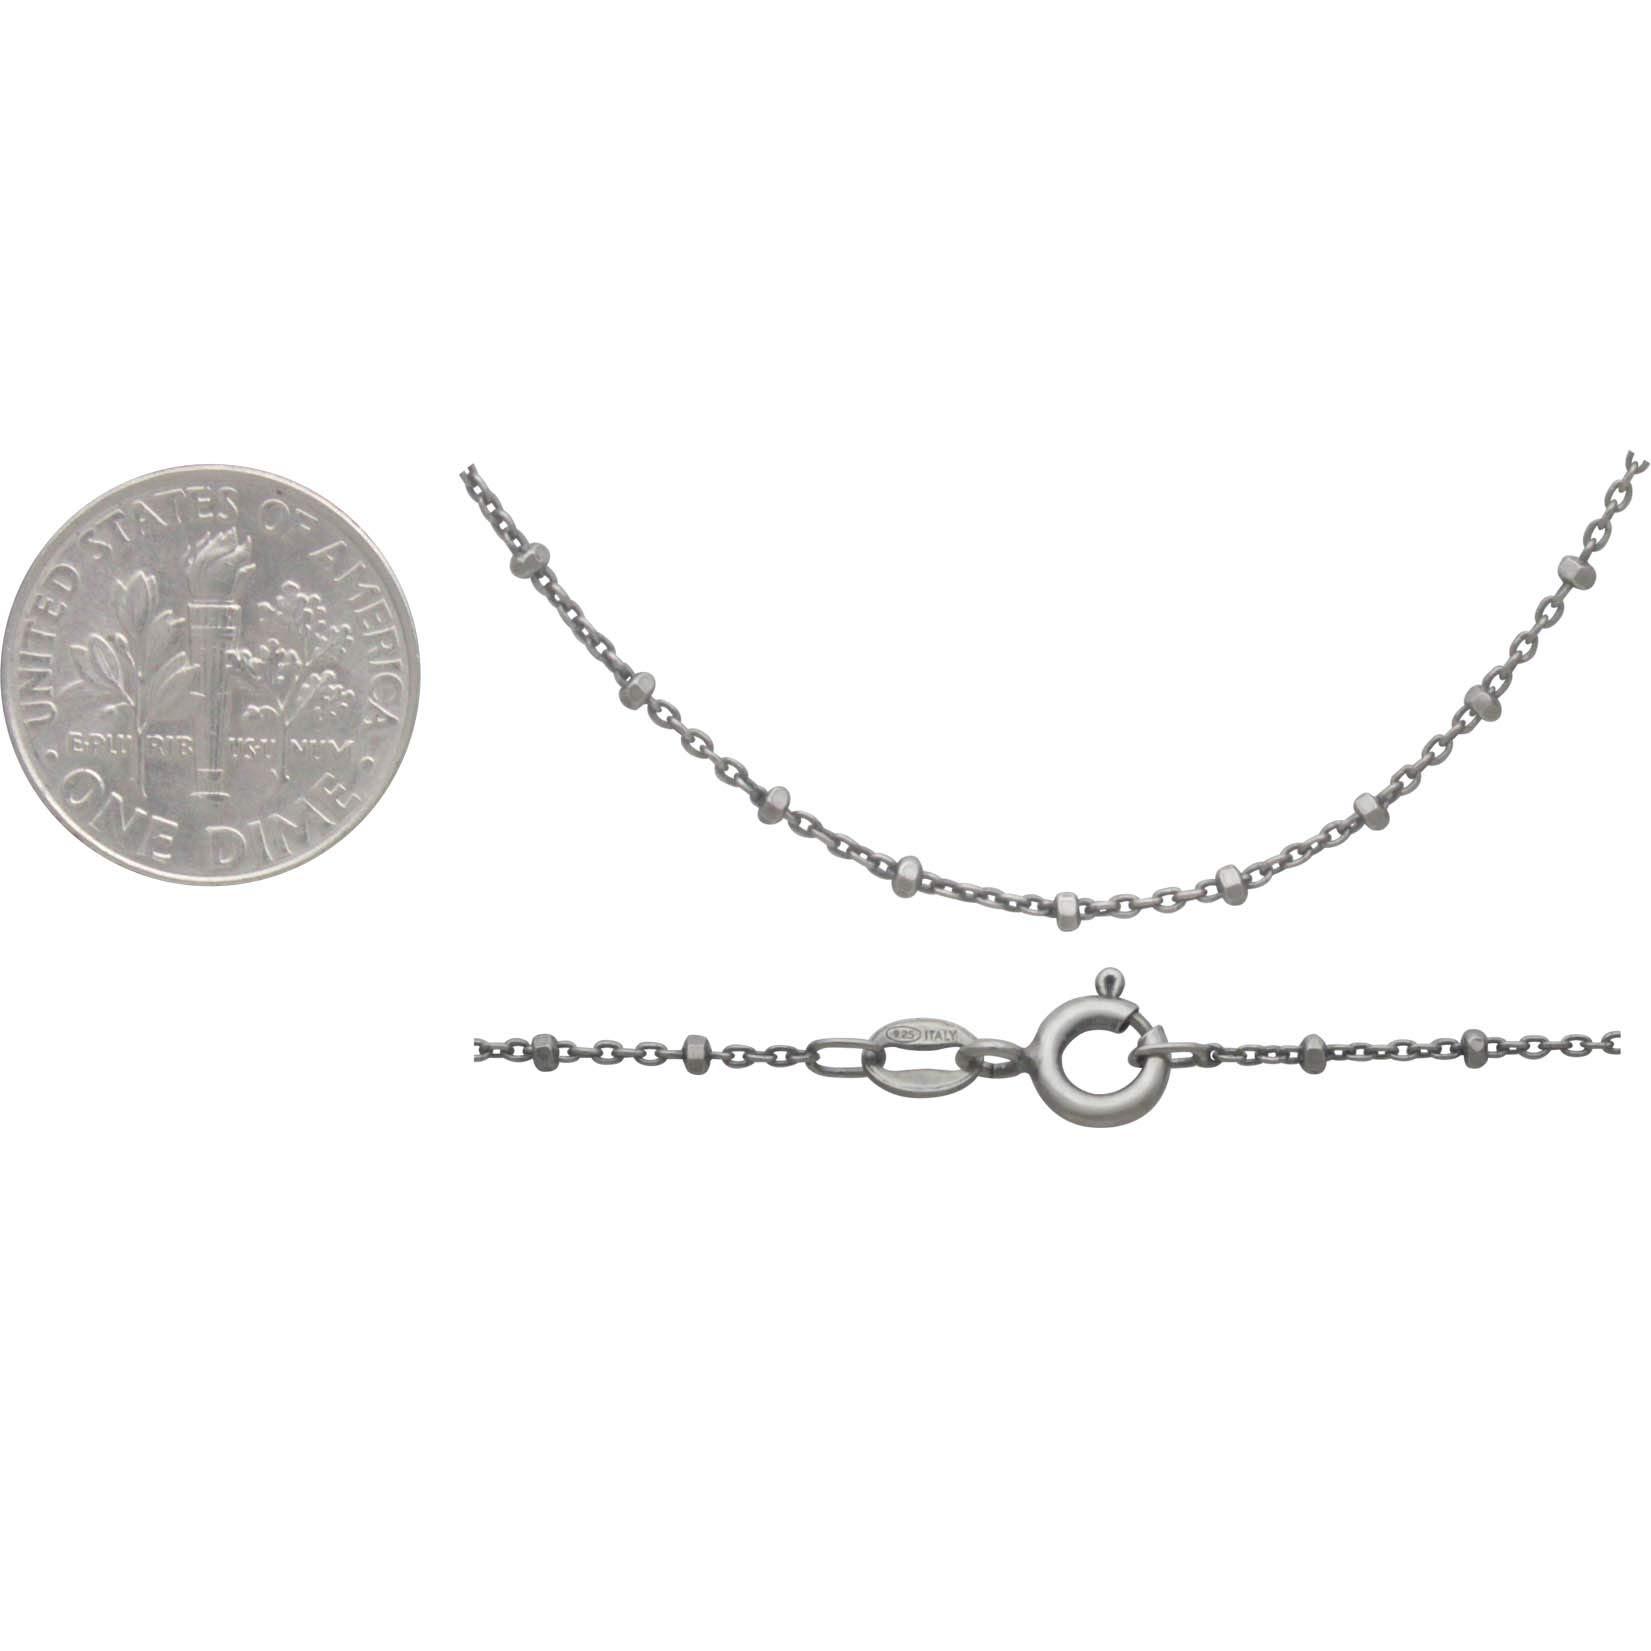 Sterling Silver Chain - 24 inch Diamond Cut Station Chain